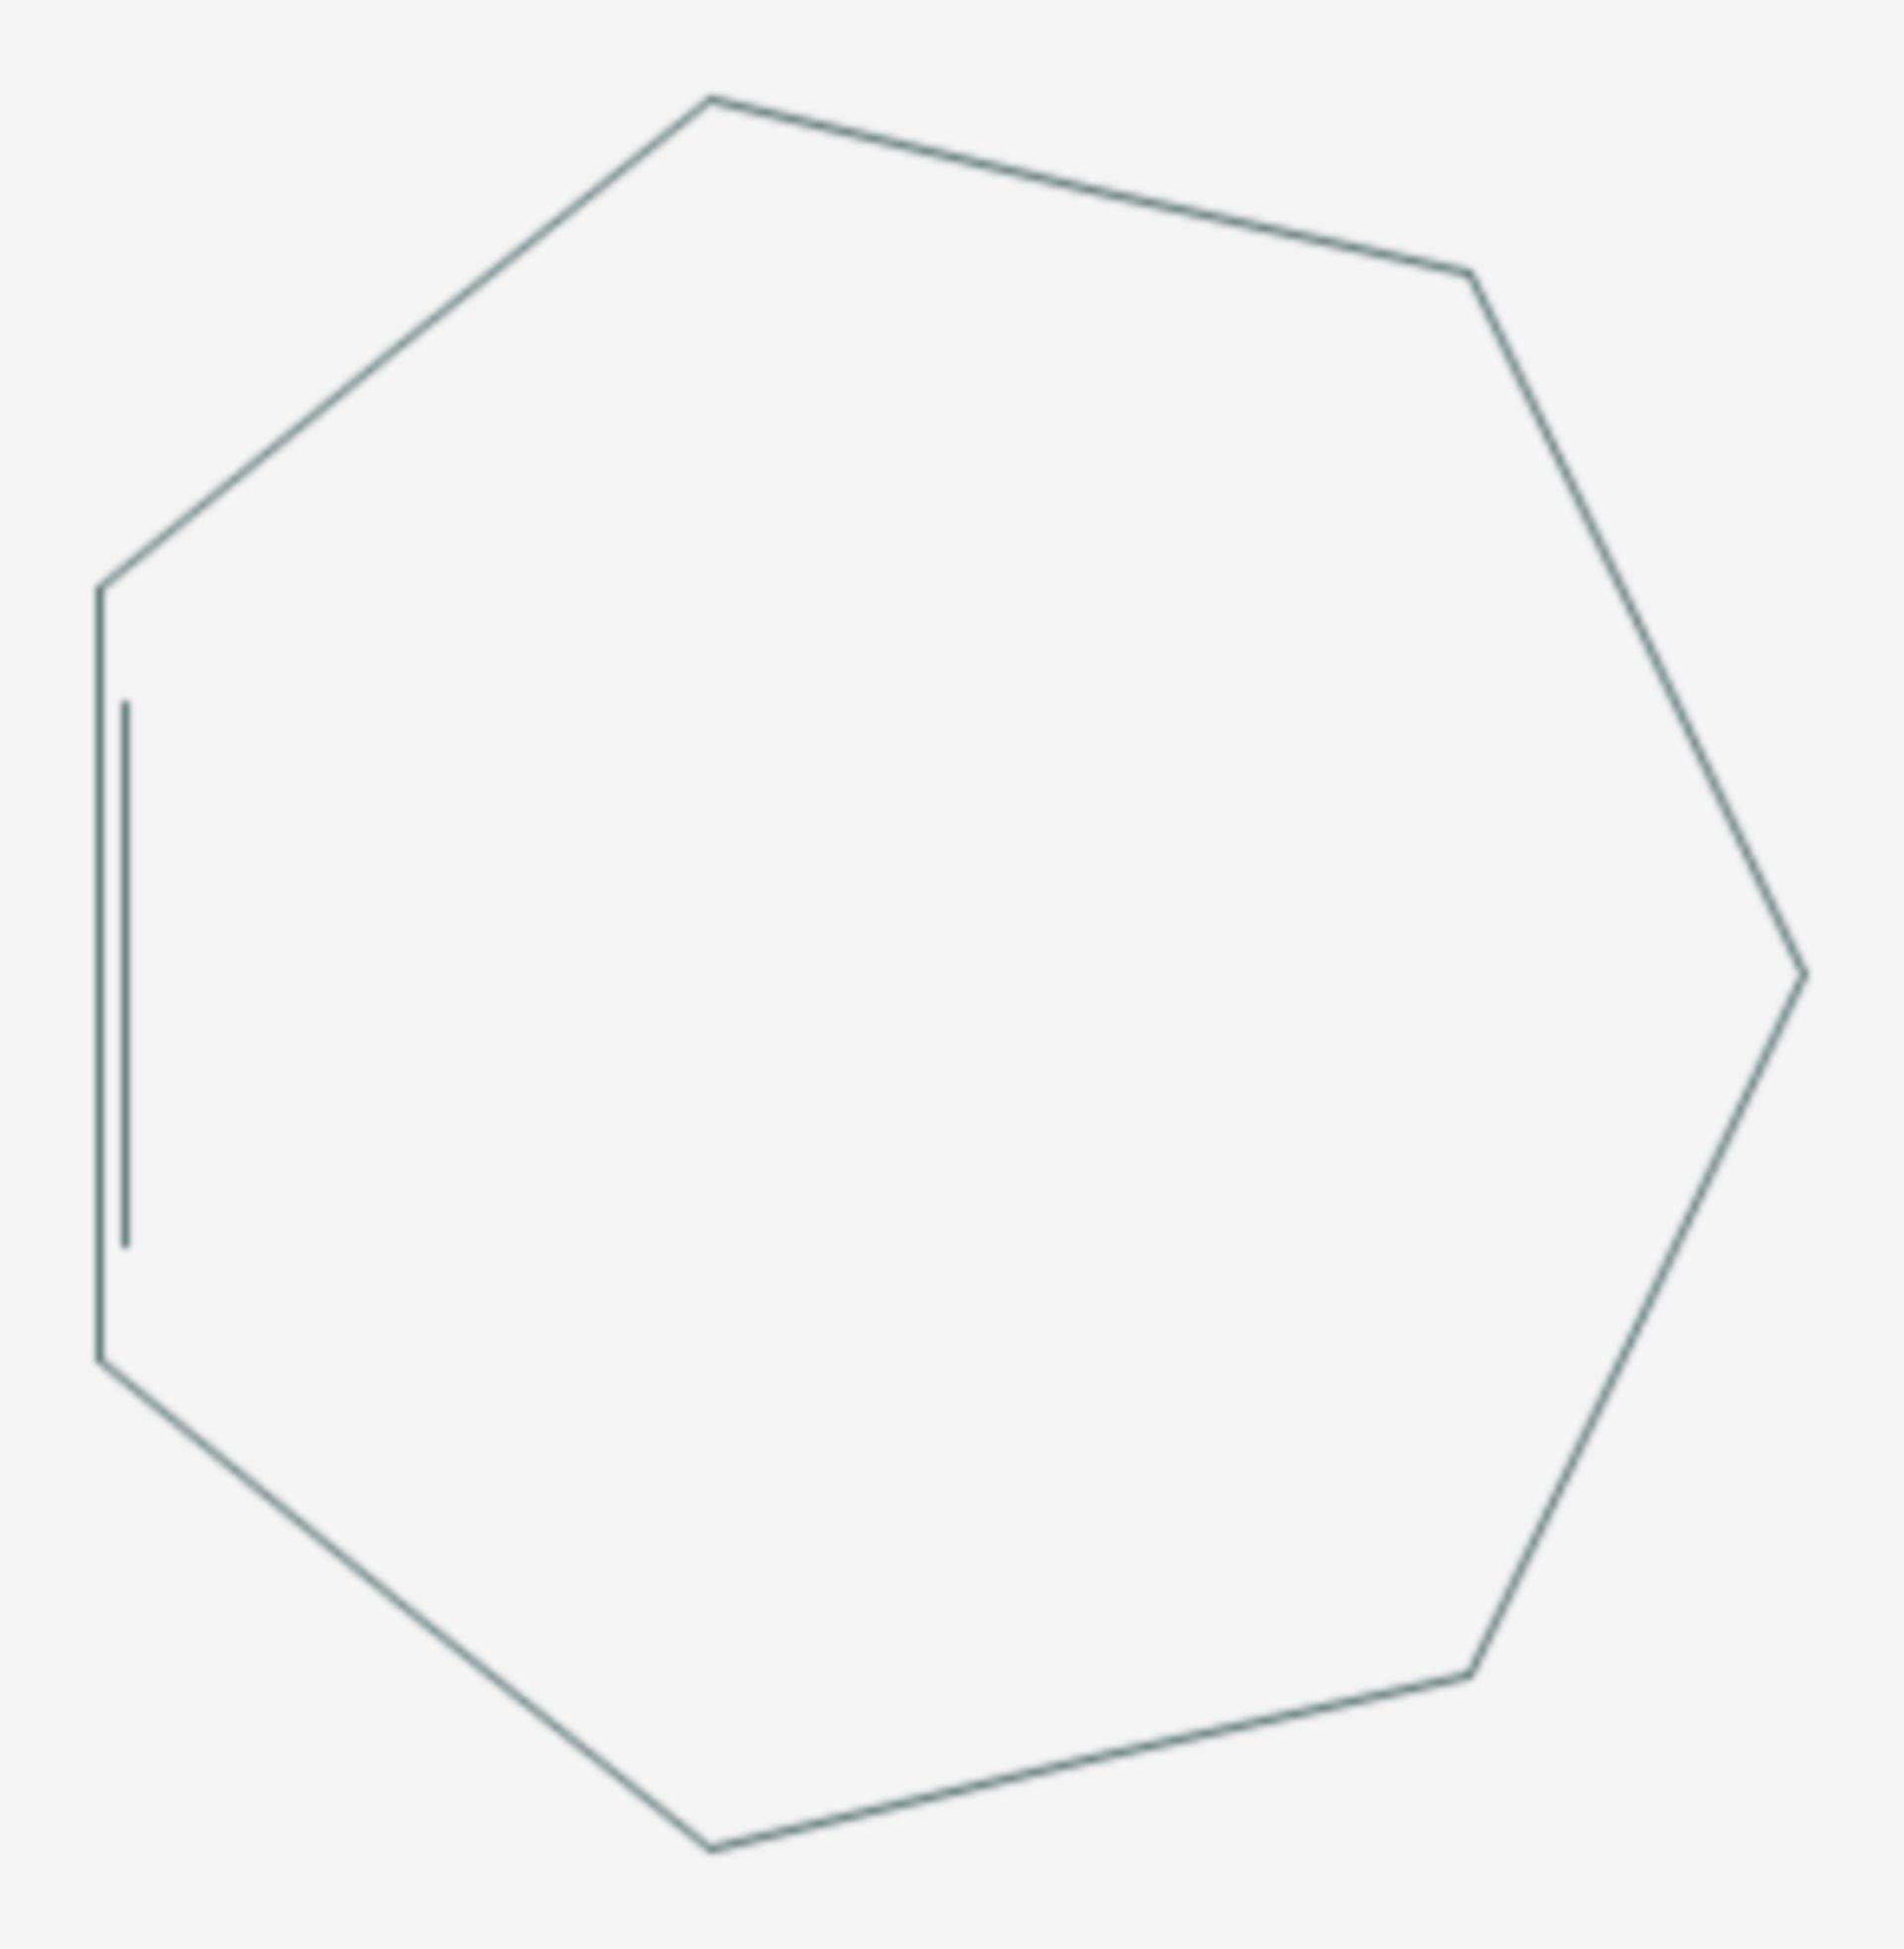 Cyclohepten (Strukturformel)